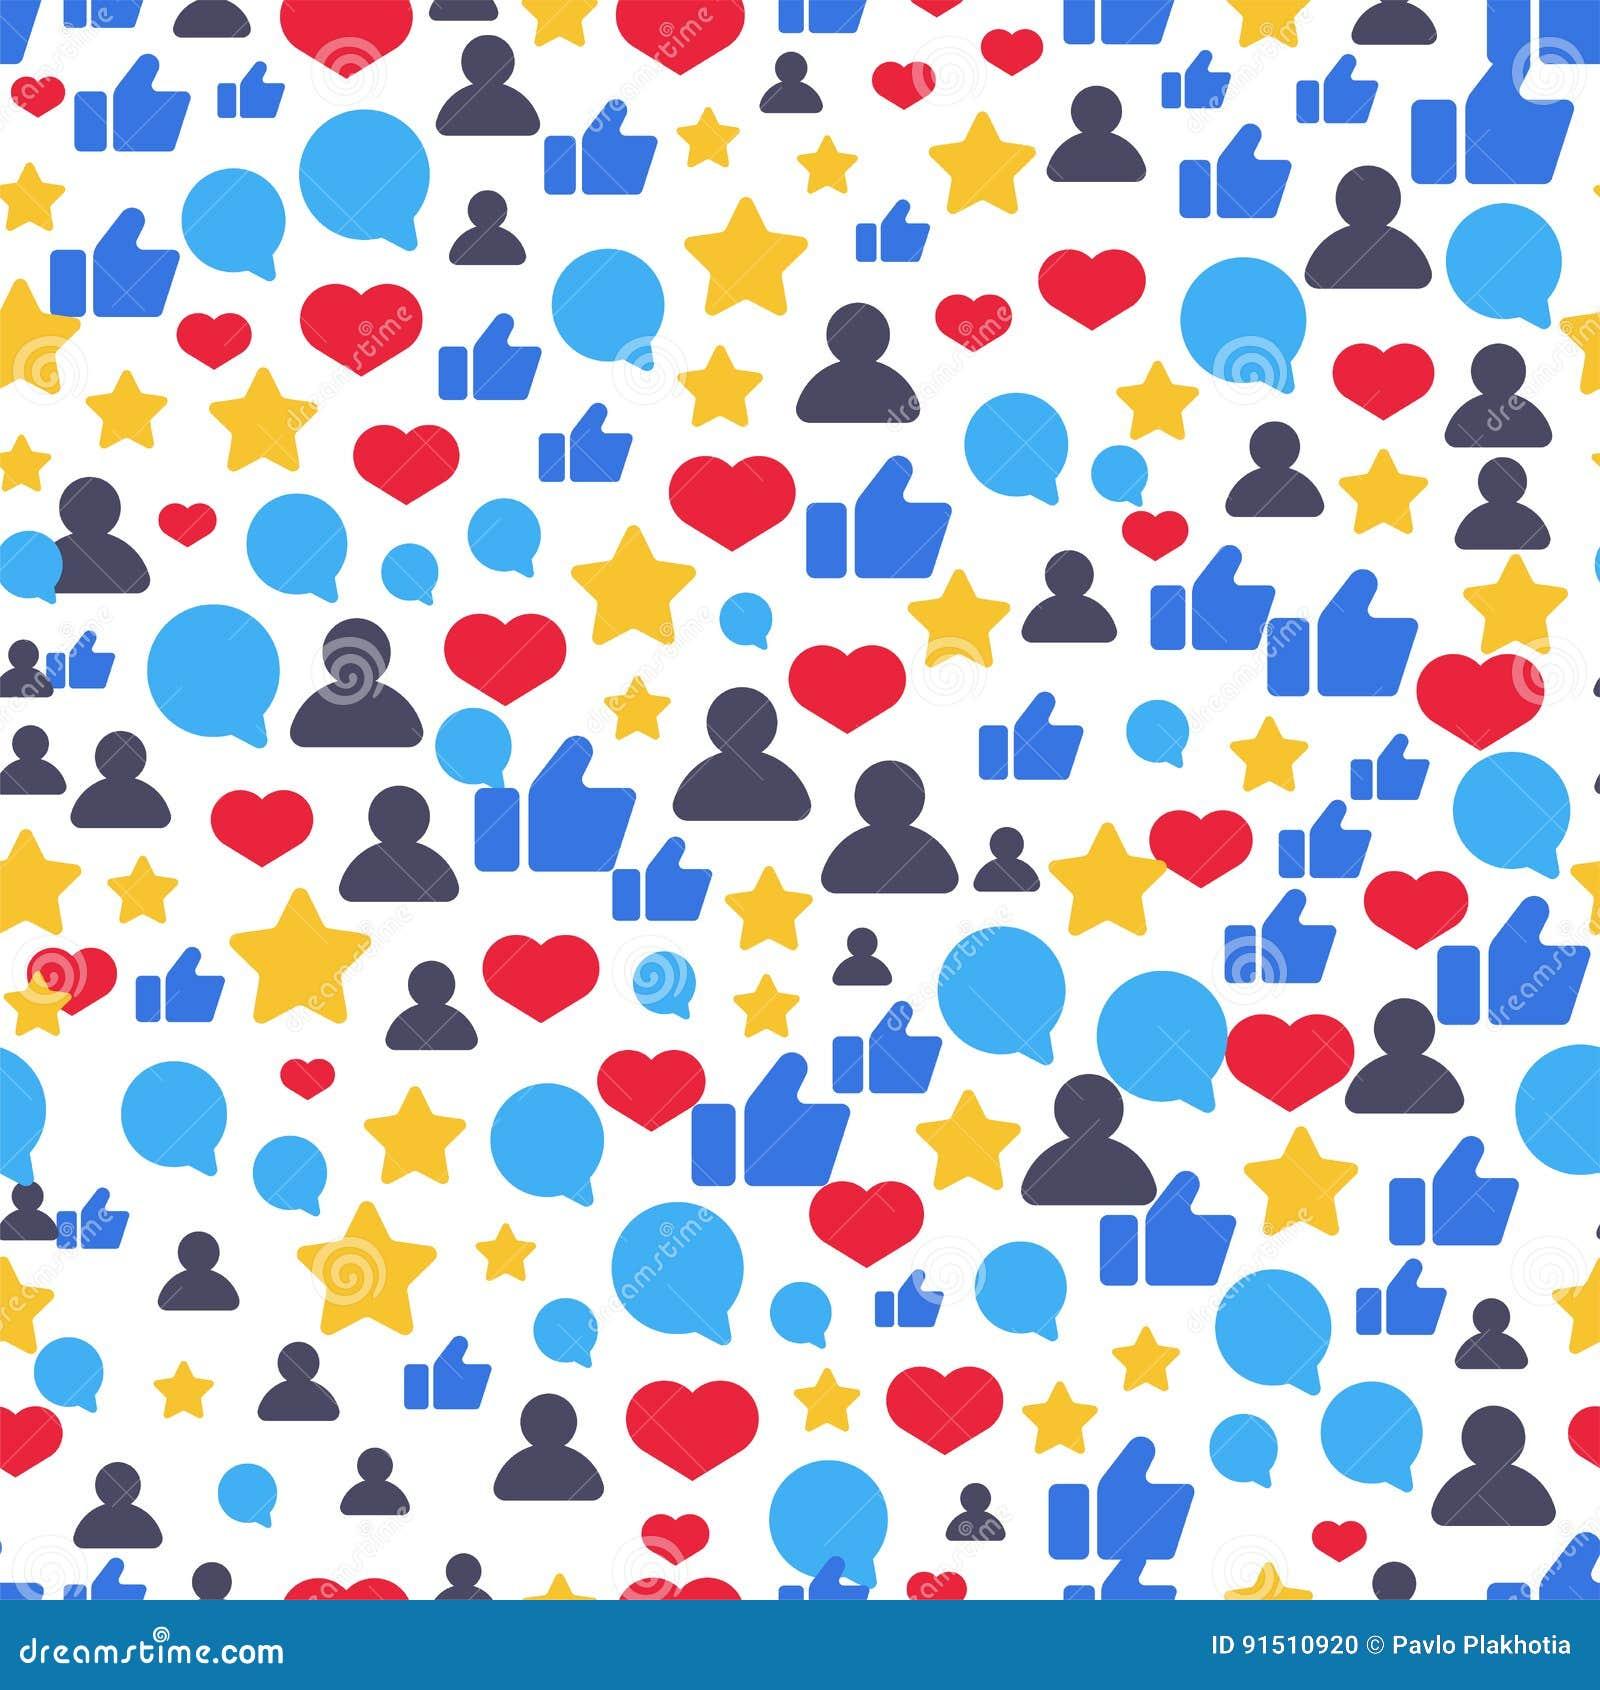 Seamless Pattern With Speech Bubbles, Likes, Followers Symbols